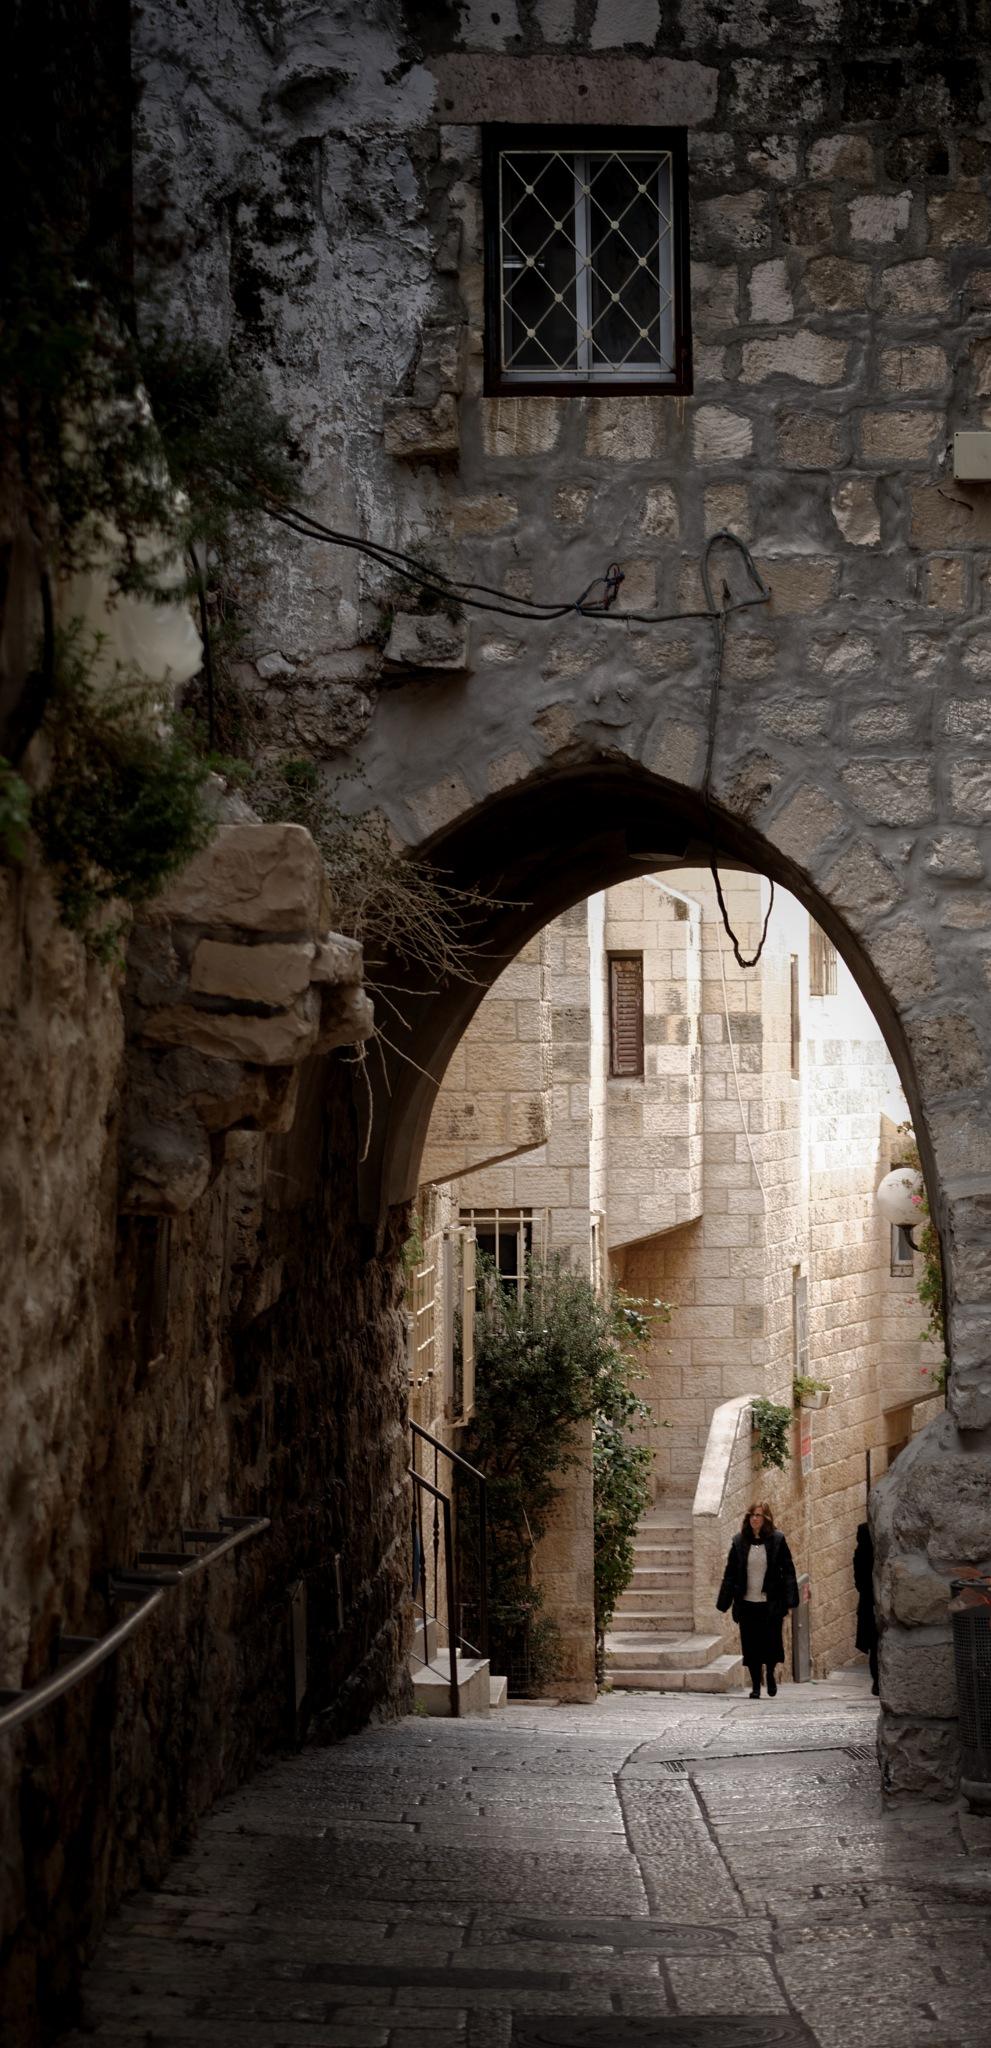 Pics from Jerusalem III by Cristian Araya